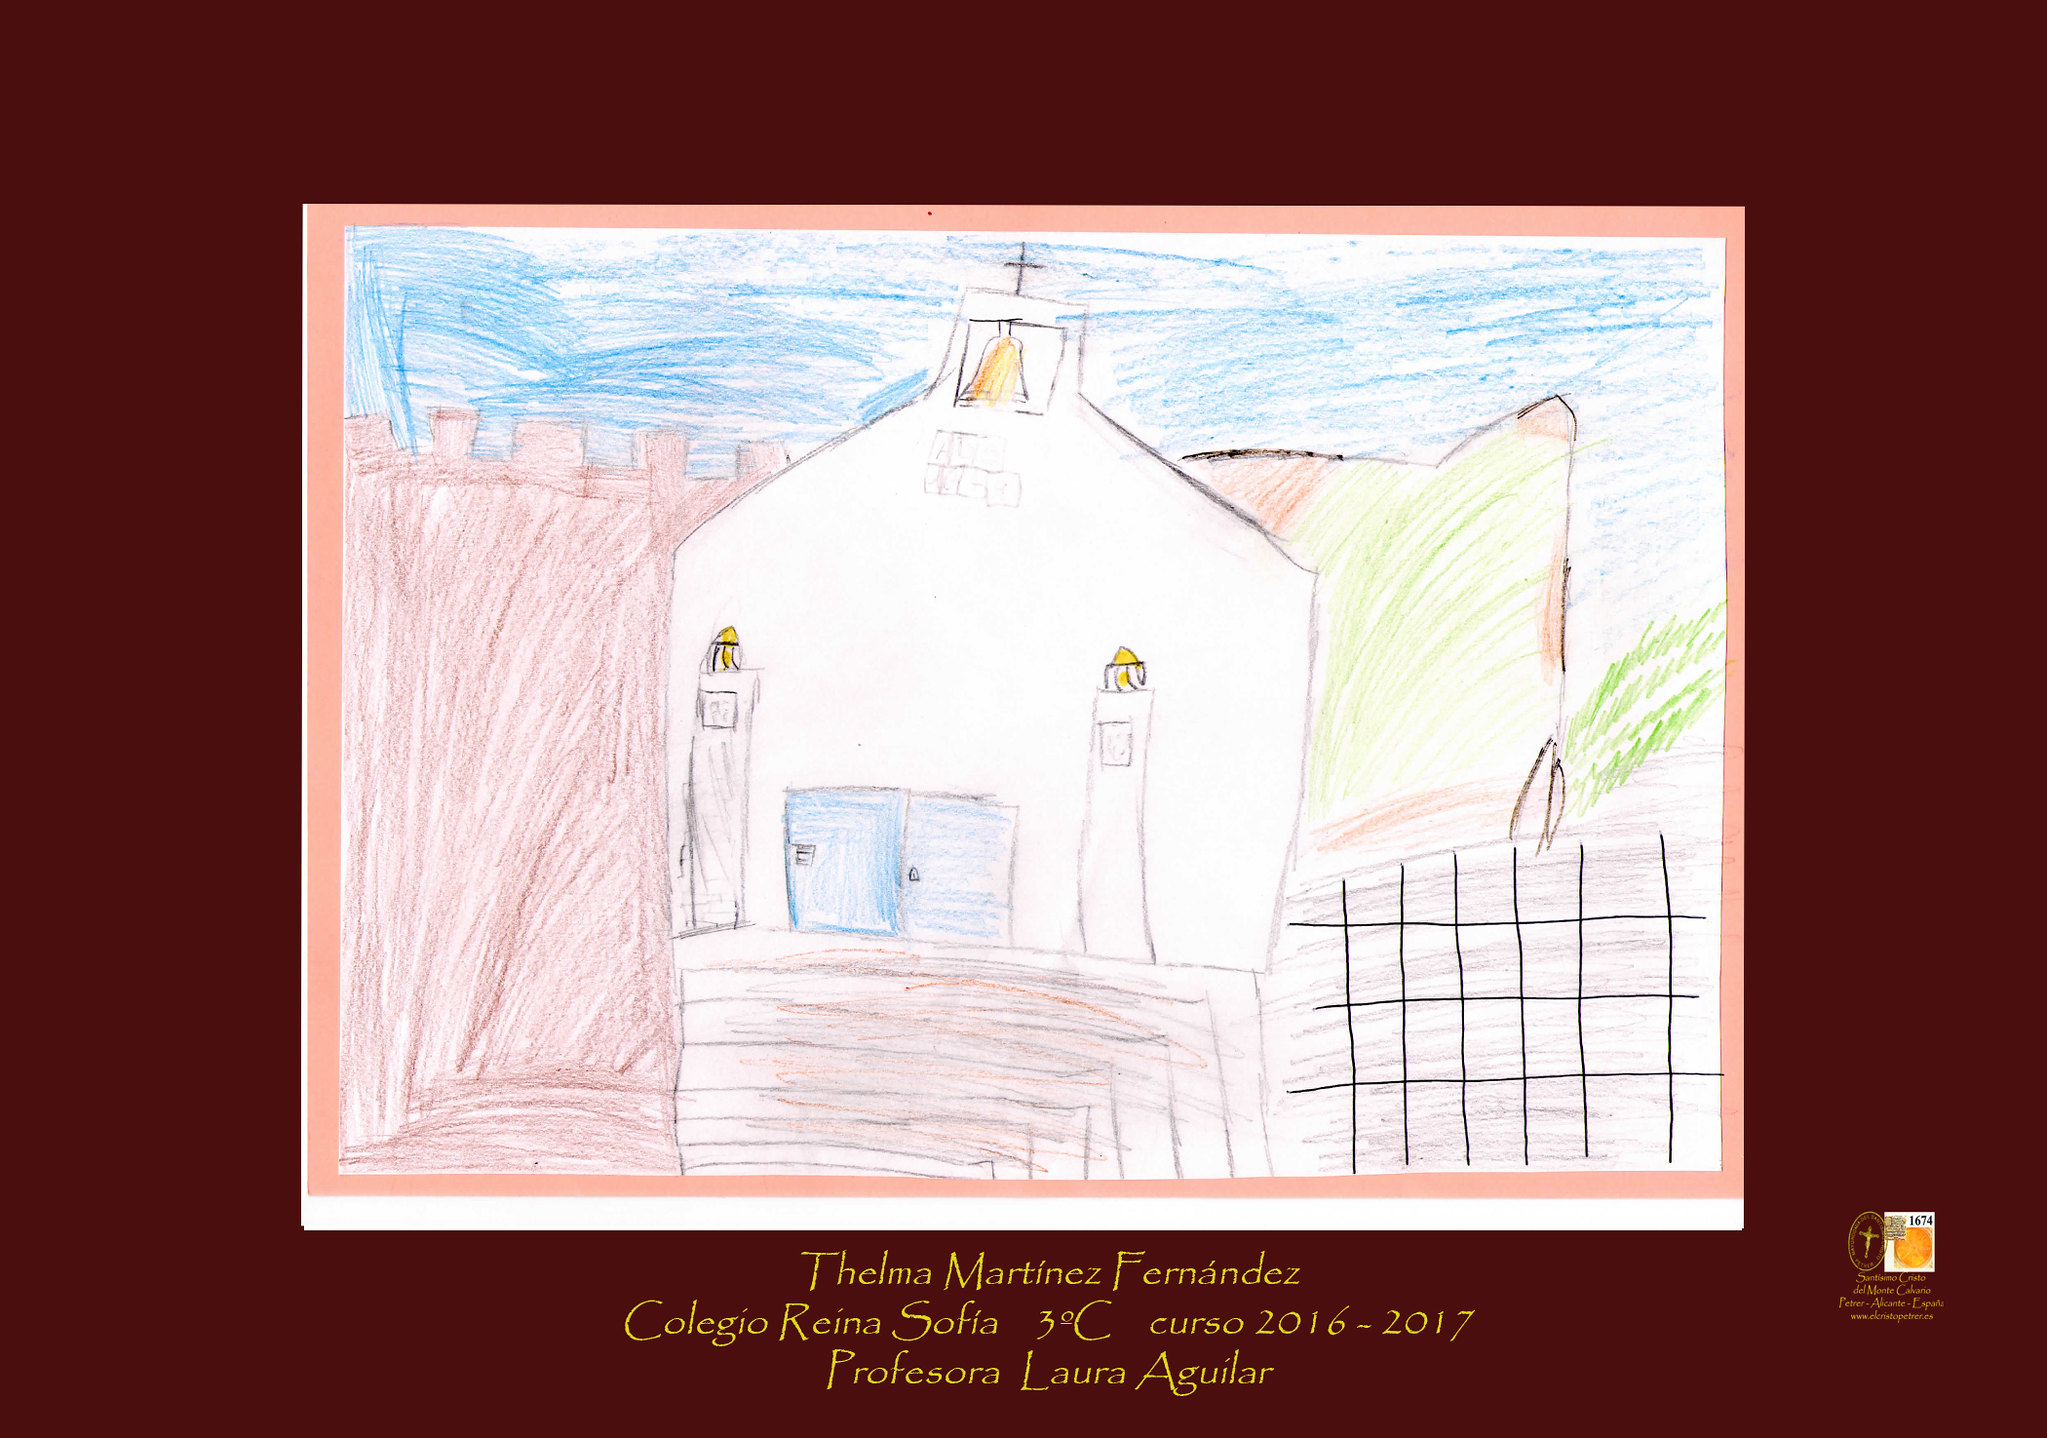 ElCristo - Actos - Exposicion Fotografica - (2017-12-01) - Reina sofía - 3ºC - Thelma Martínez Fernández